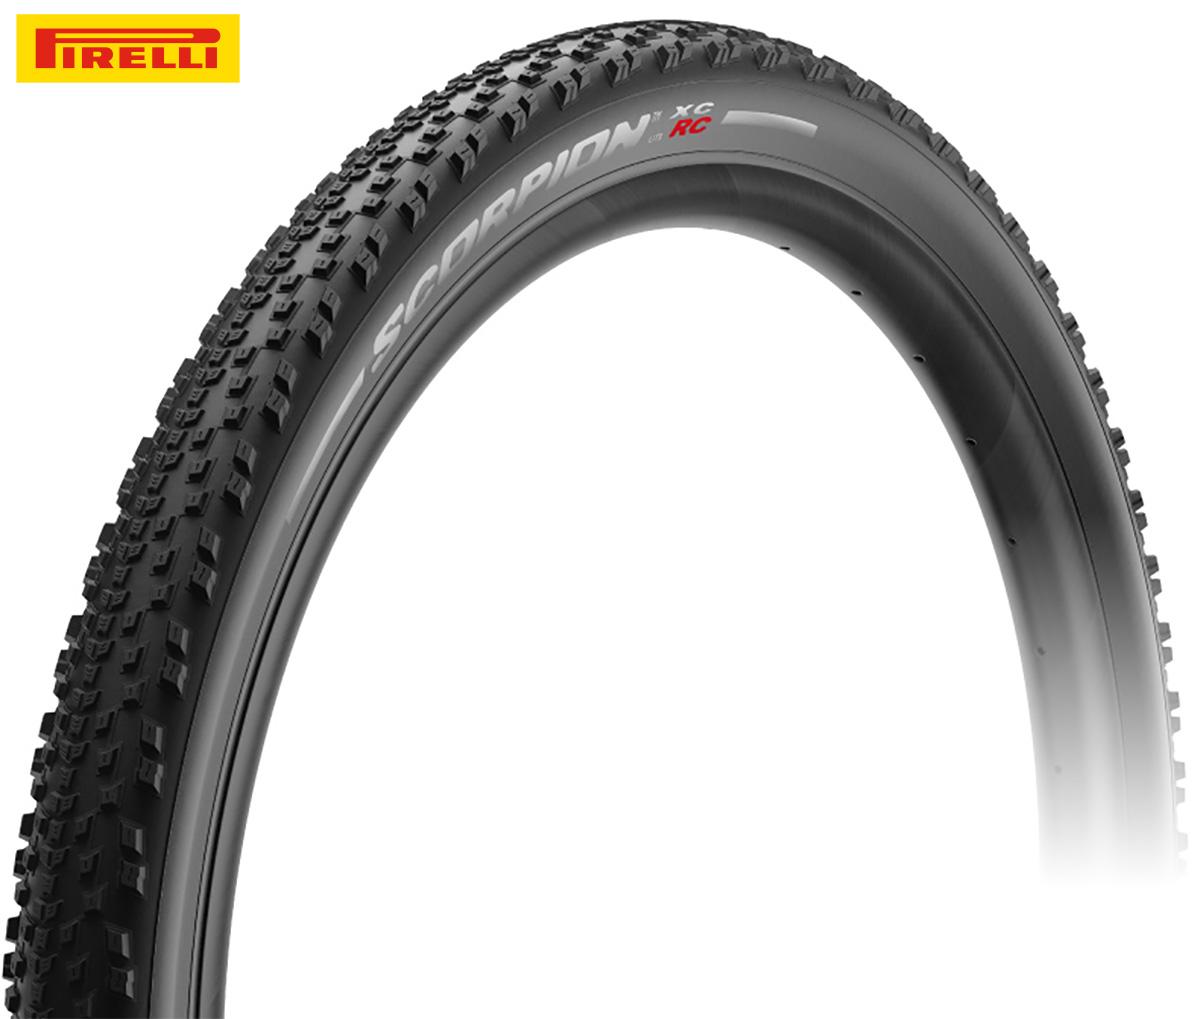 Copertoni per mountain bike Pirelli Scorpion XC RC 2020